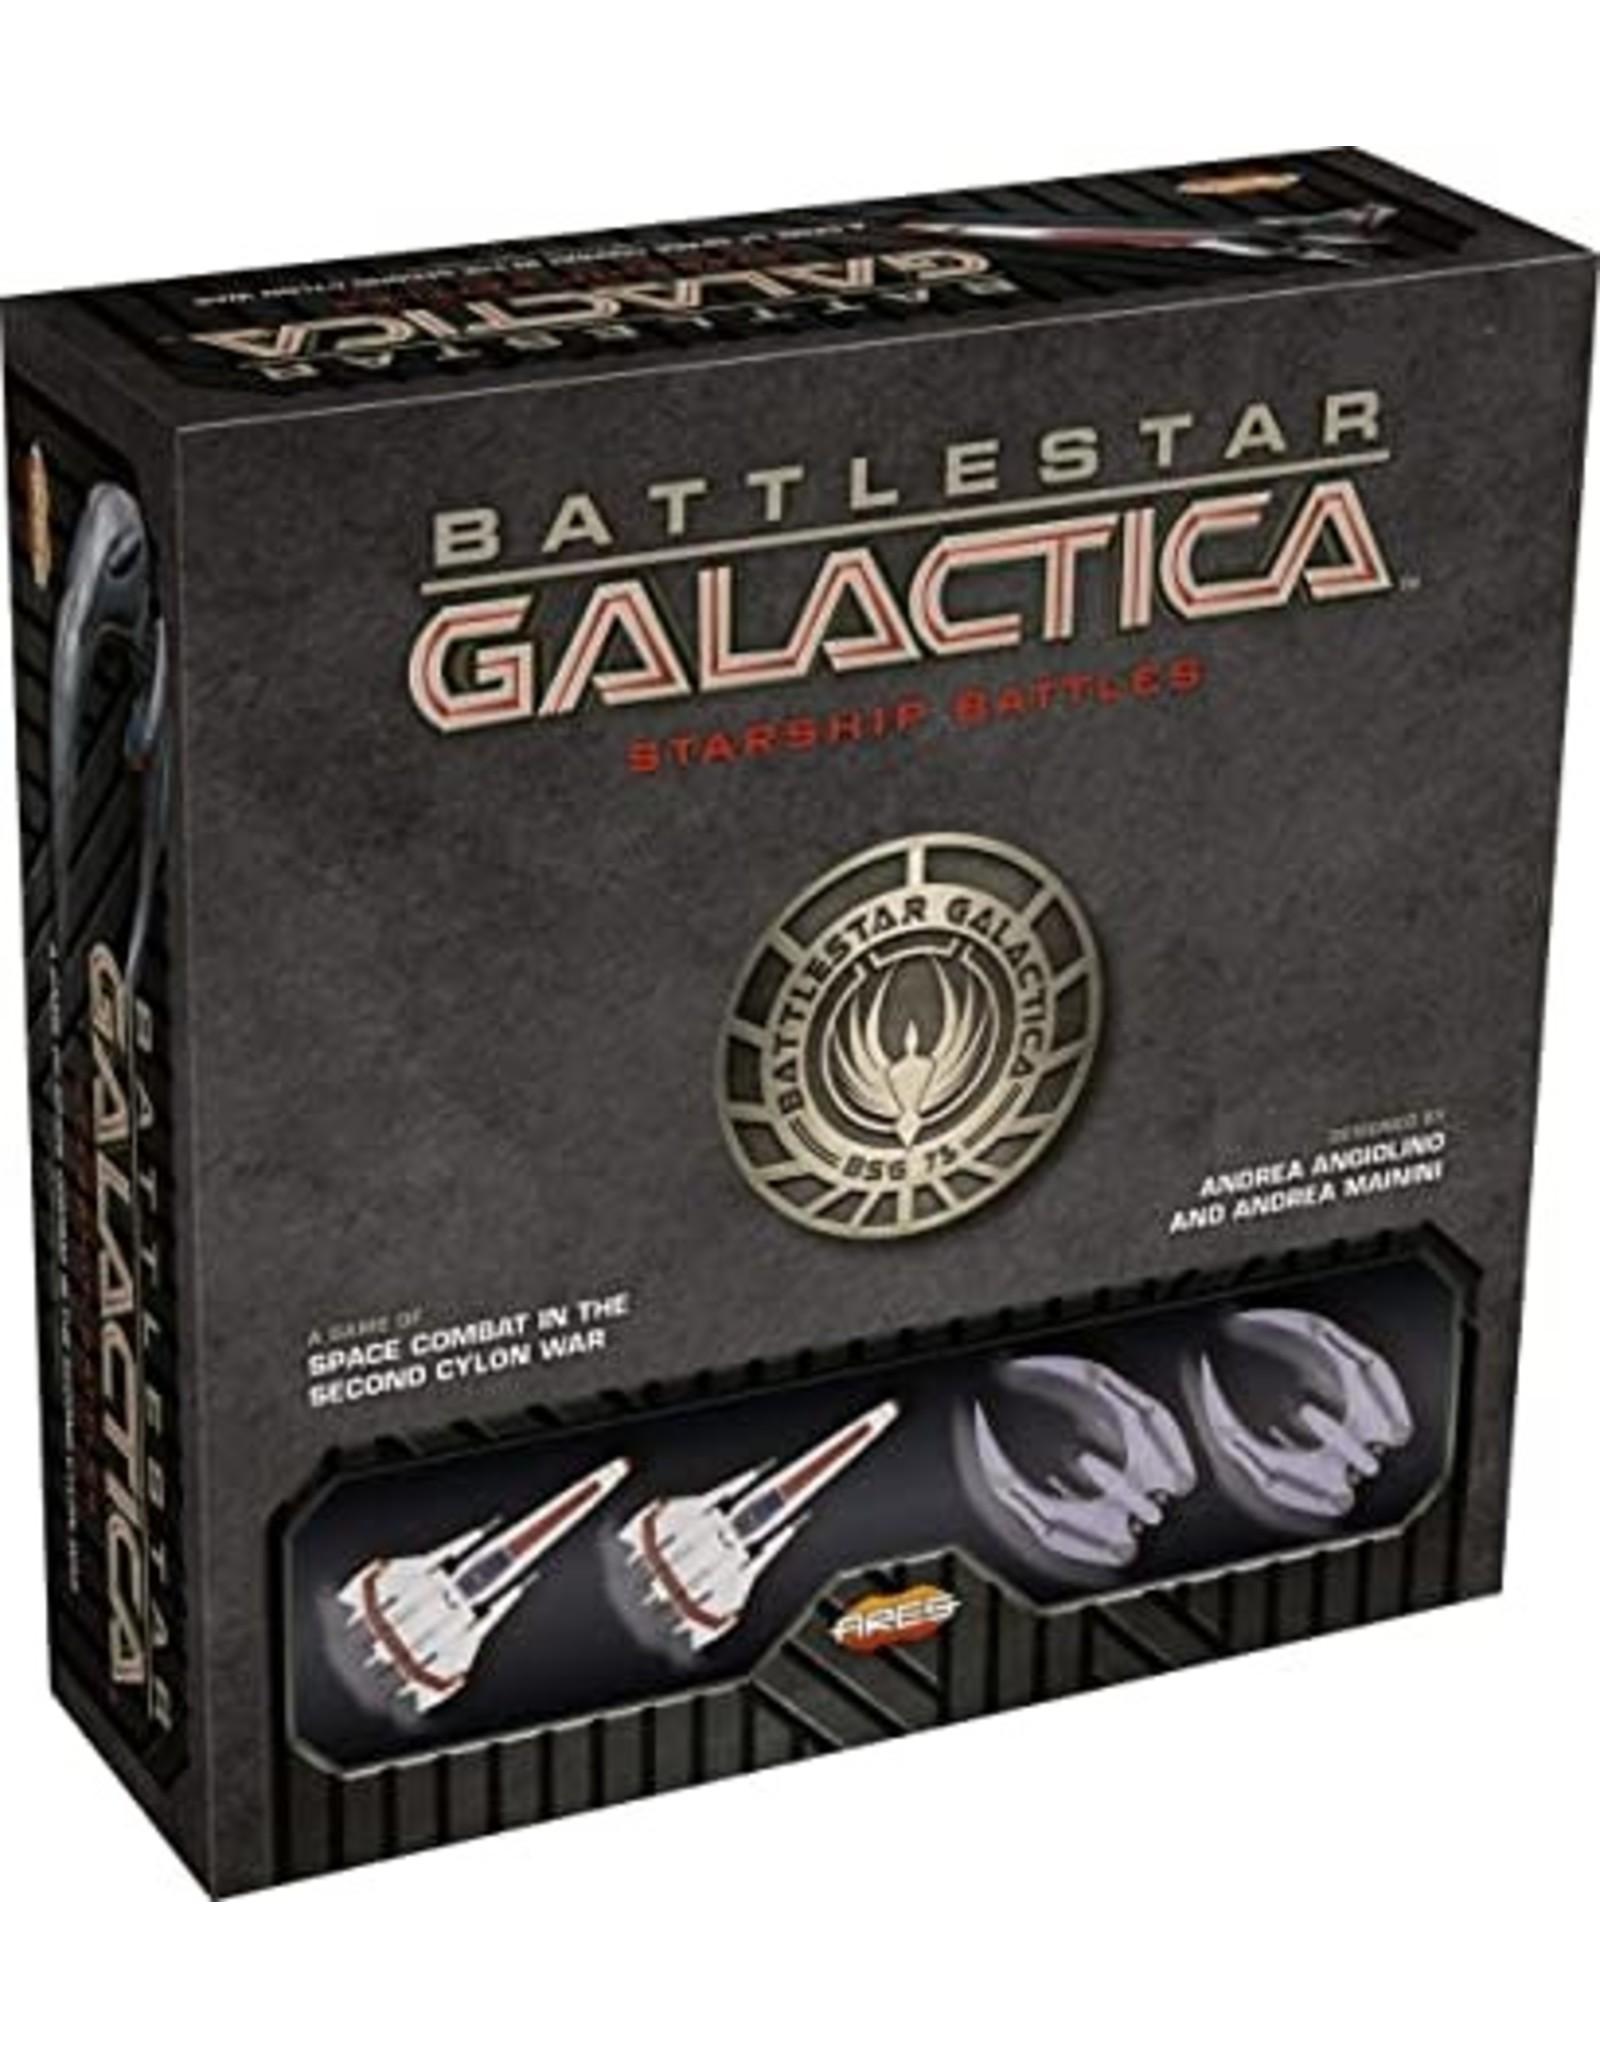 Ares Battlestar Galactica: Starship Battles